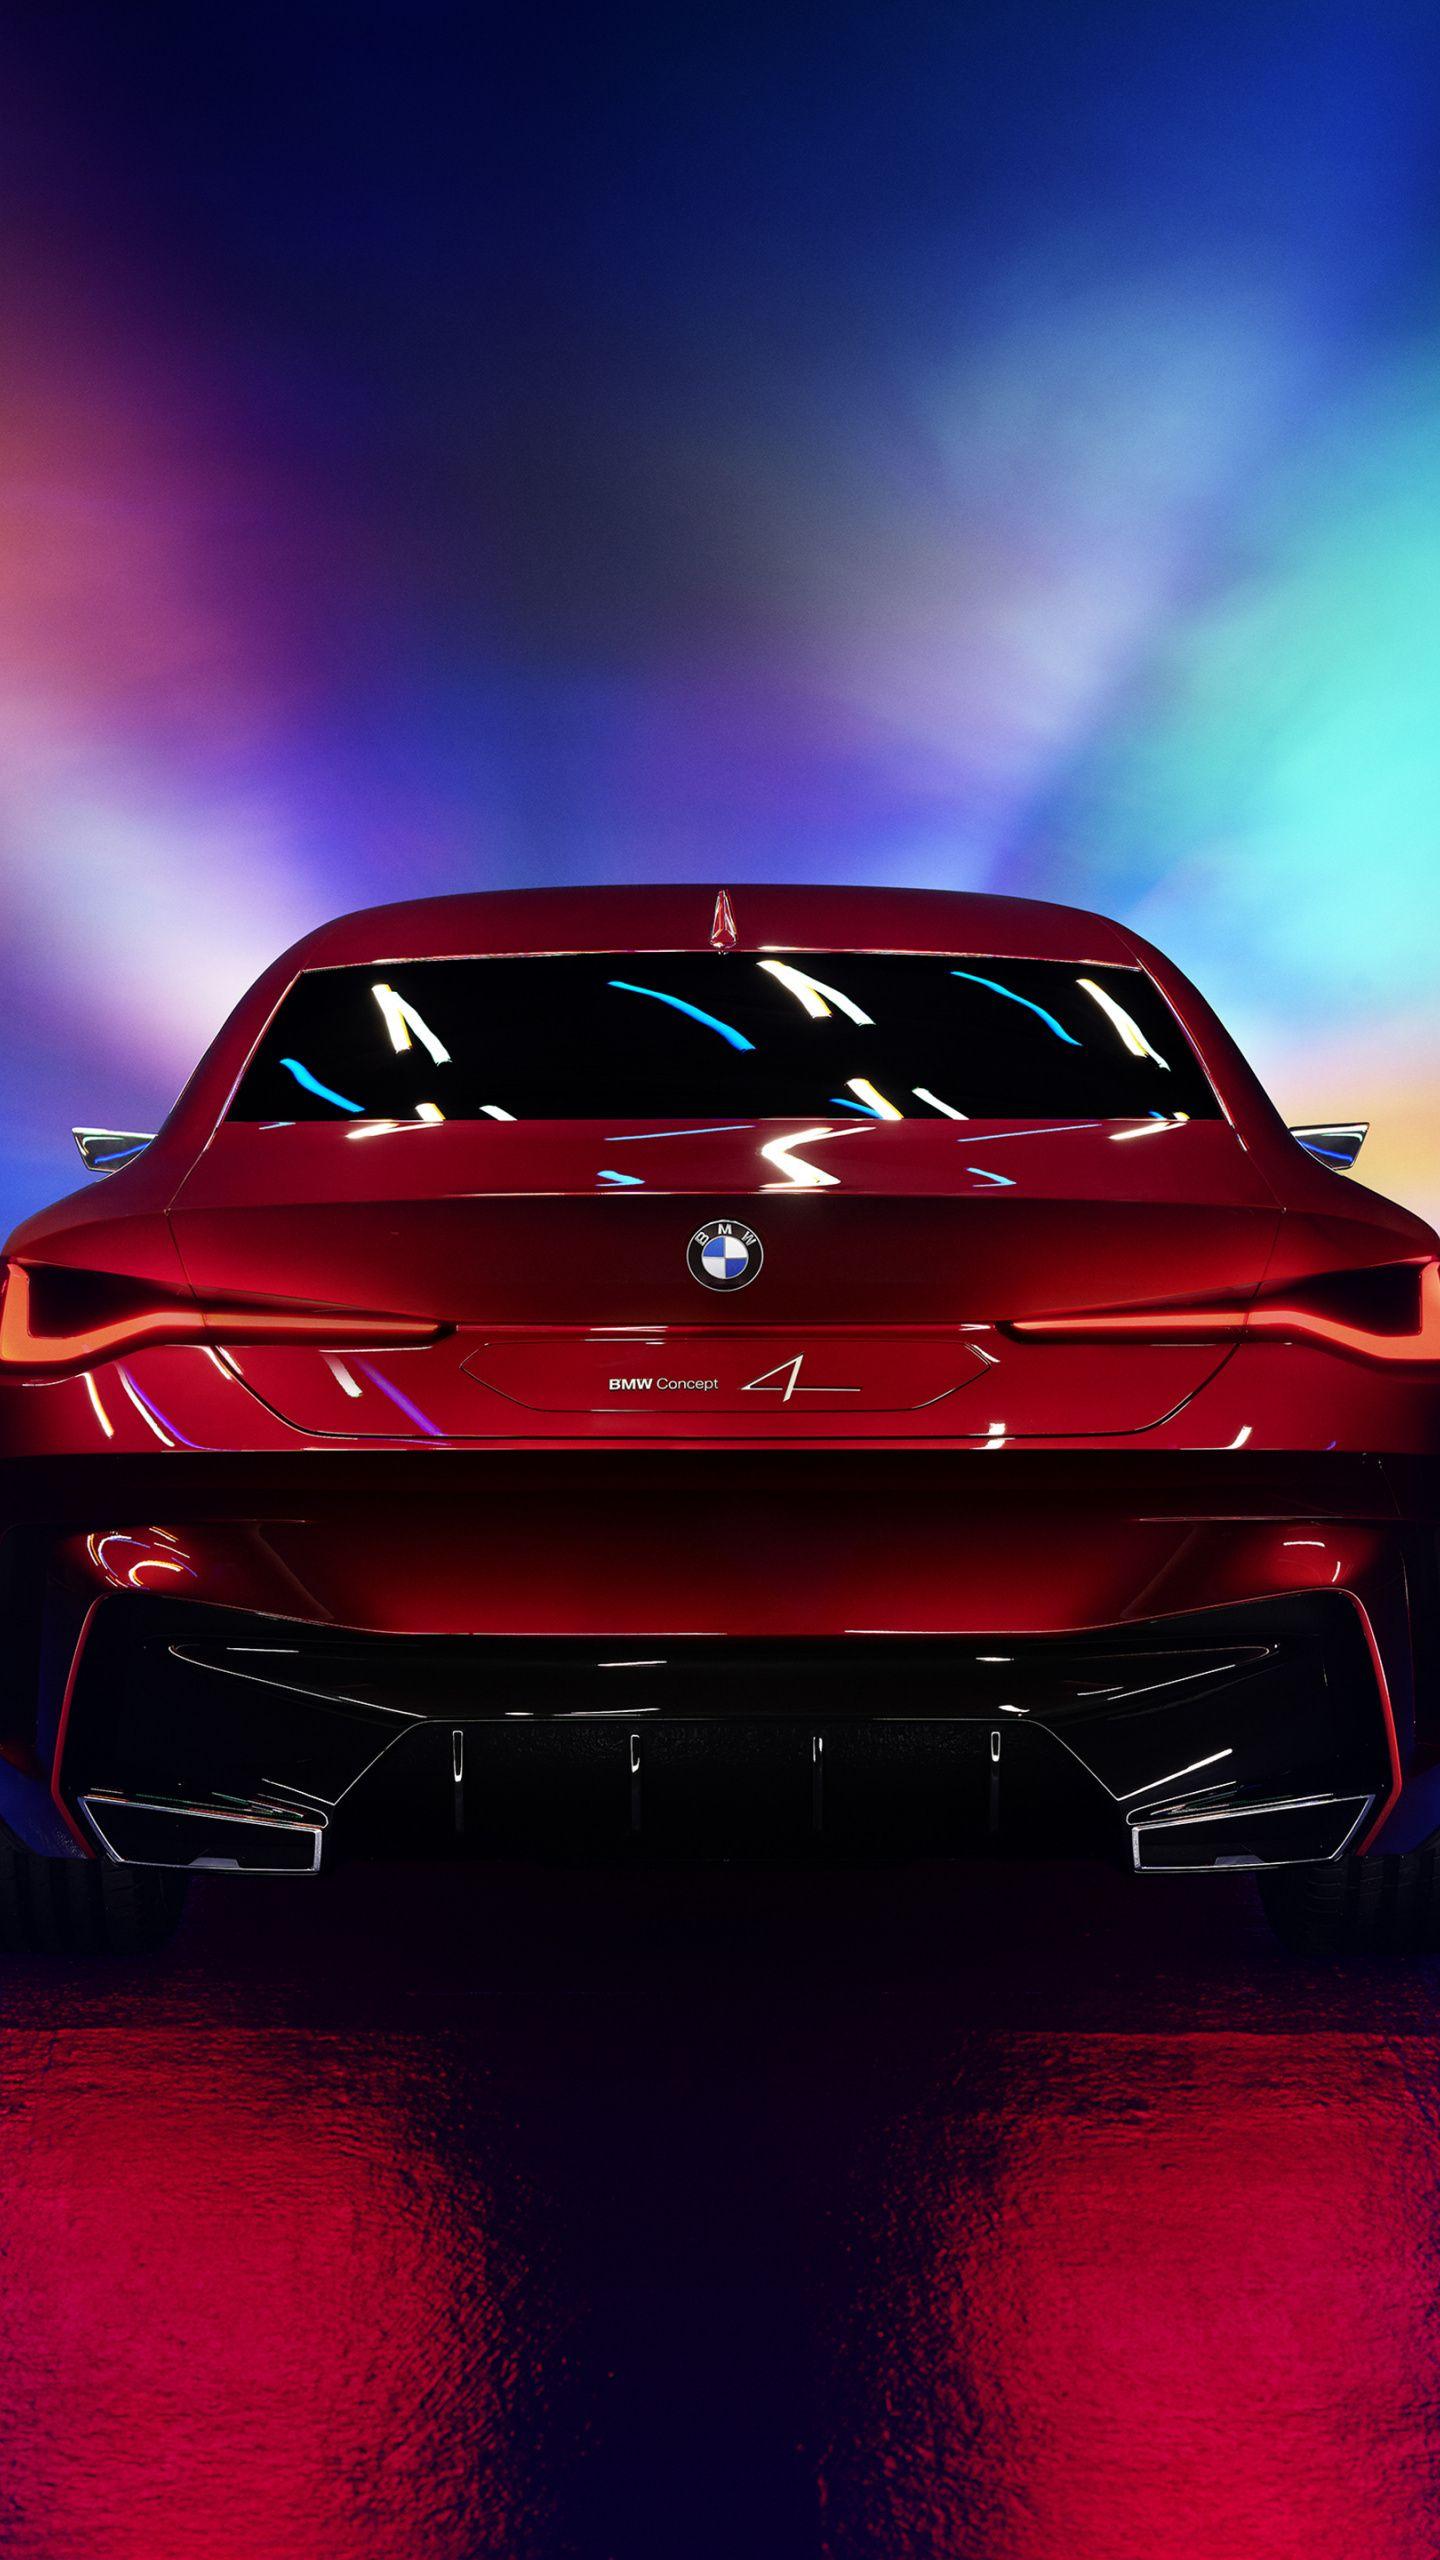 1440x2560 Bmw Concept 4 Car Rear View Wallpaper Bmw Concept Car Wallpapers Bmw